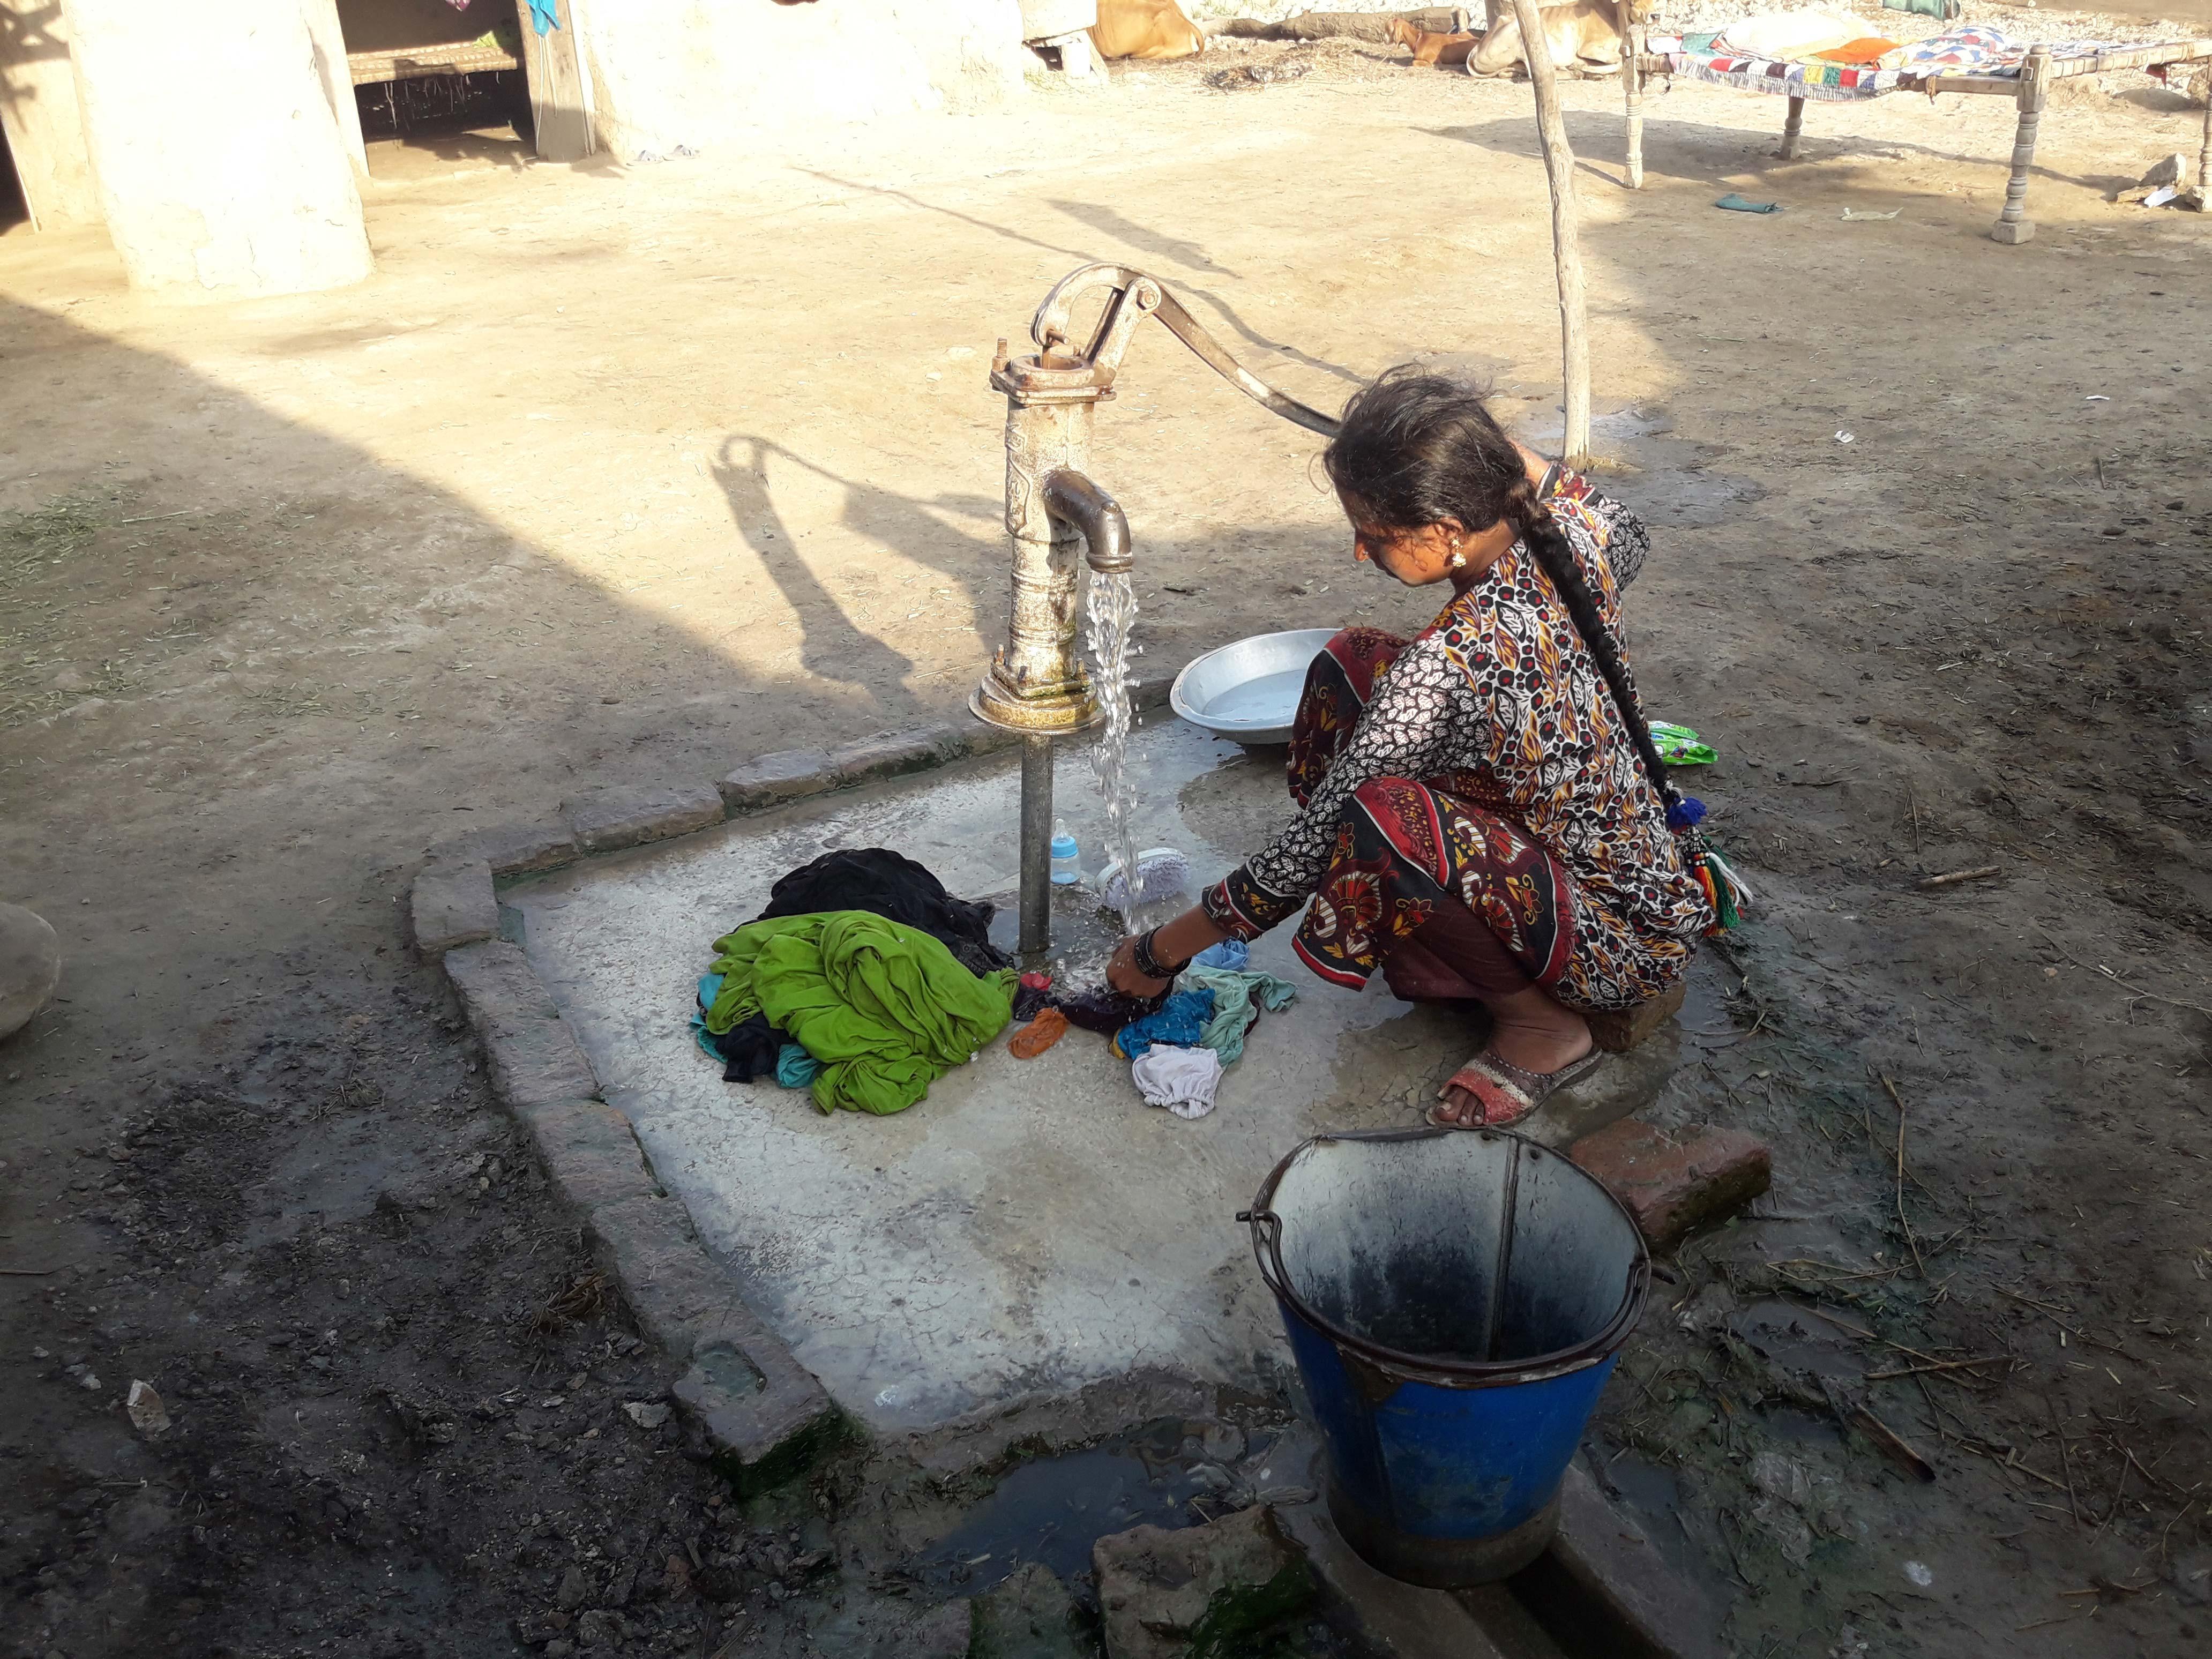 A woman in Dasti Village washing clothes under a hand-pump